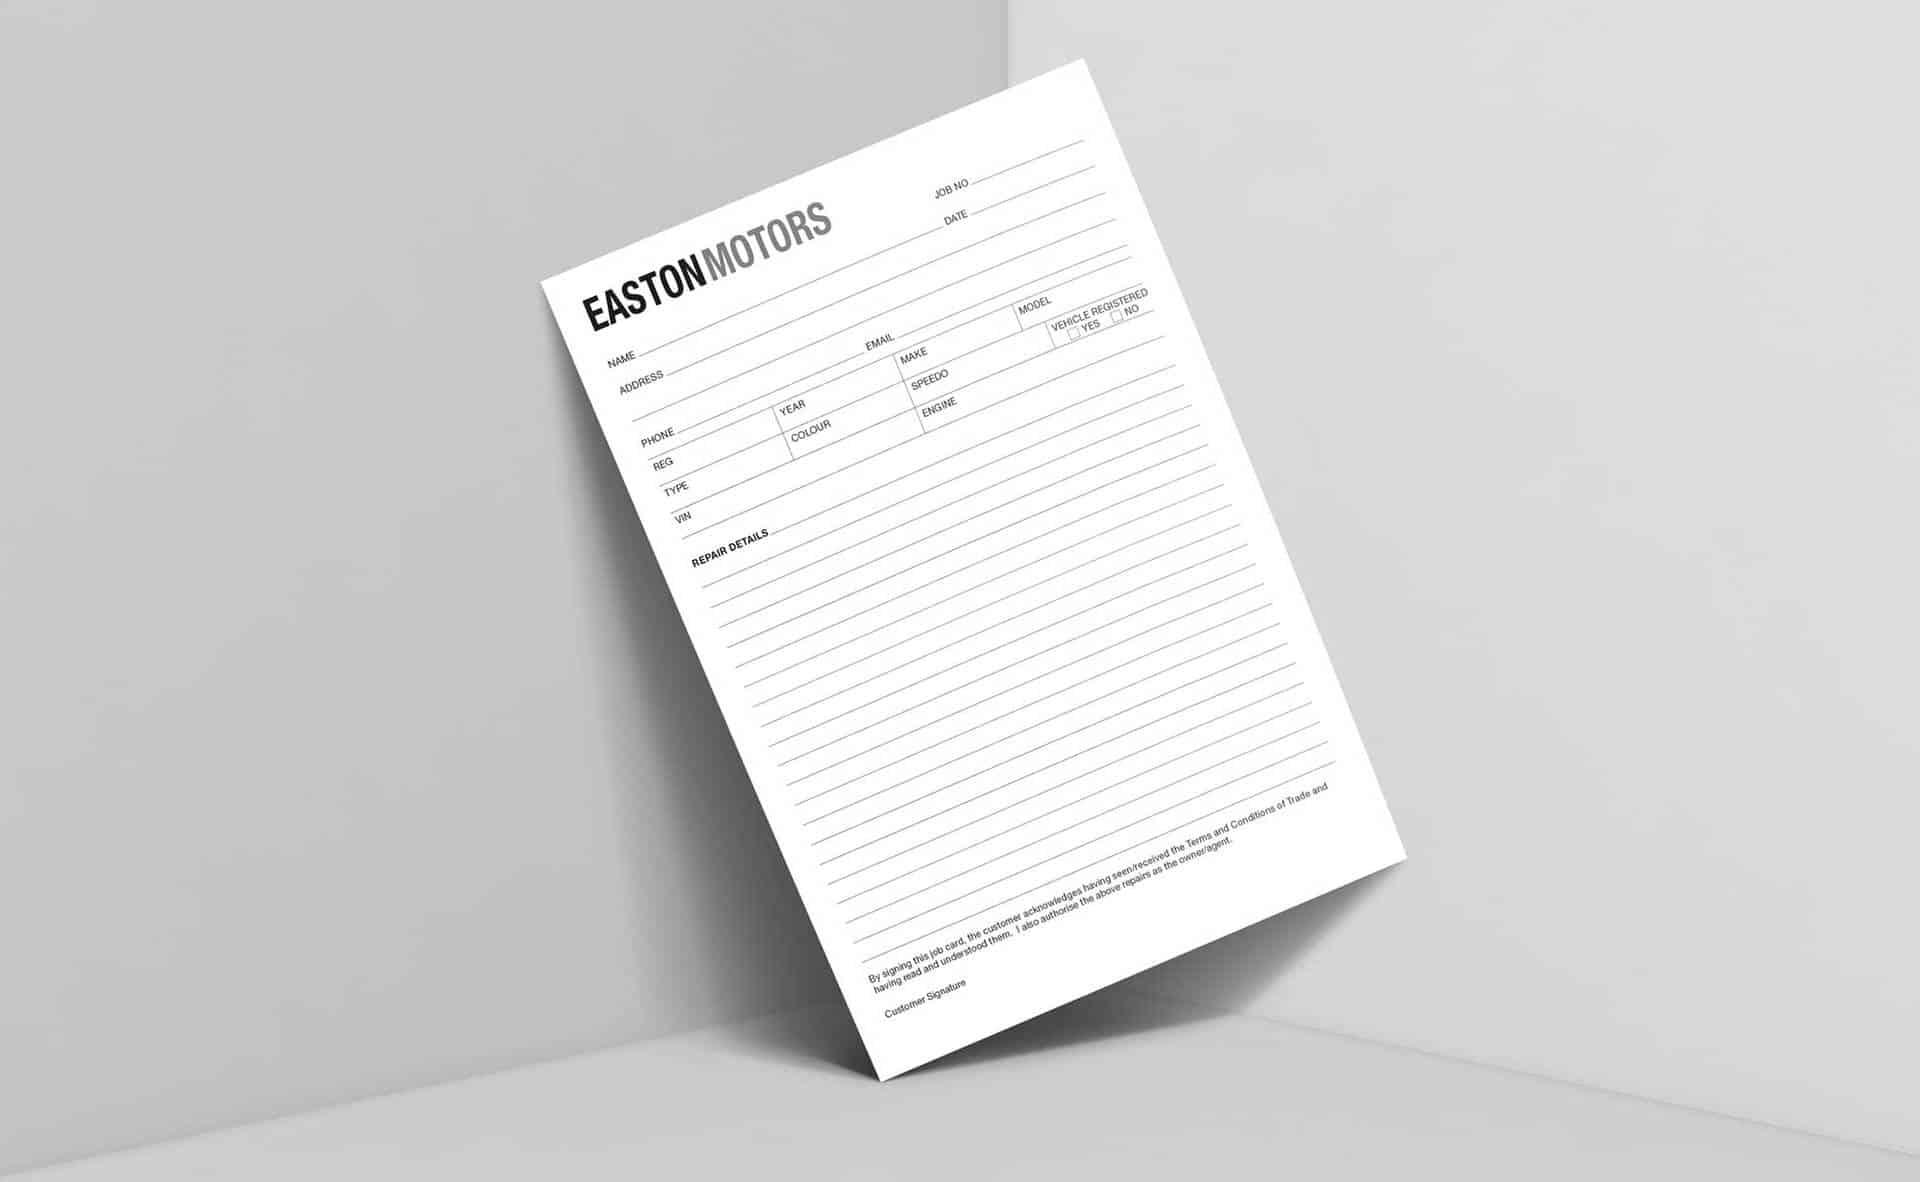 Job Cards  Mechanics, Repairs, Workshops & More — Zoozoo Printing Intended For Mechanics Job Card Template